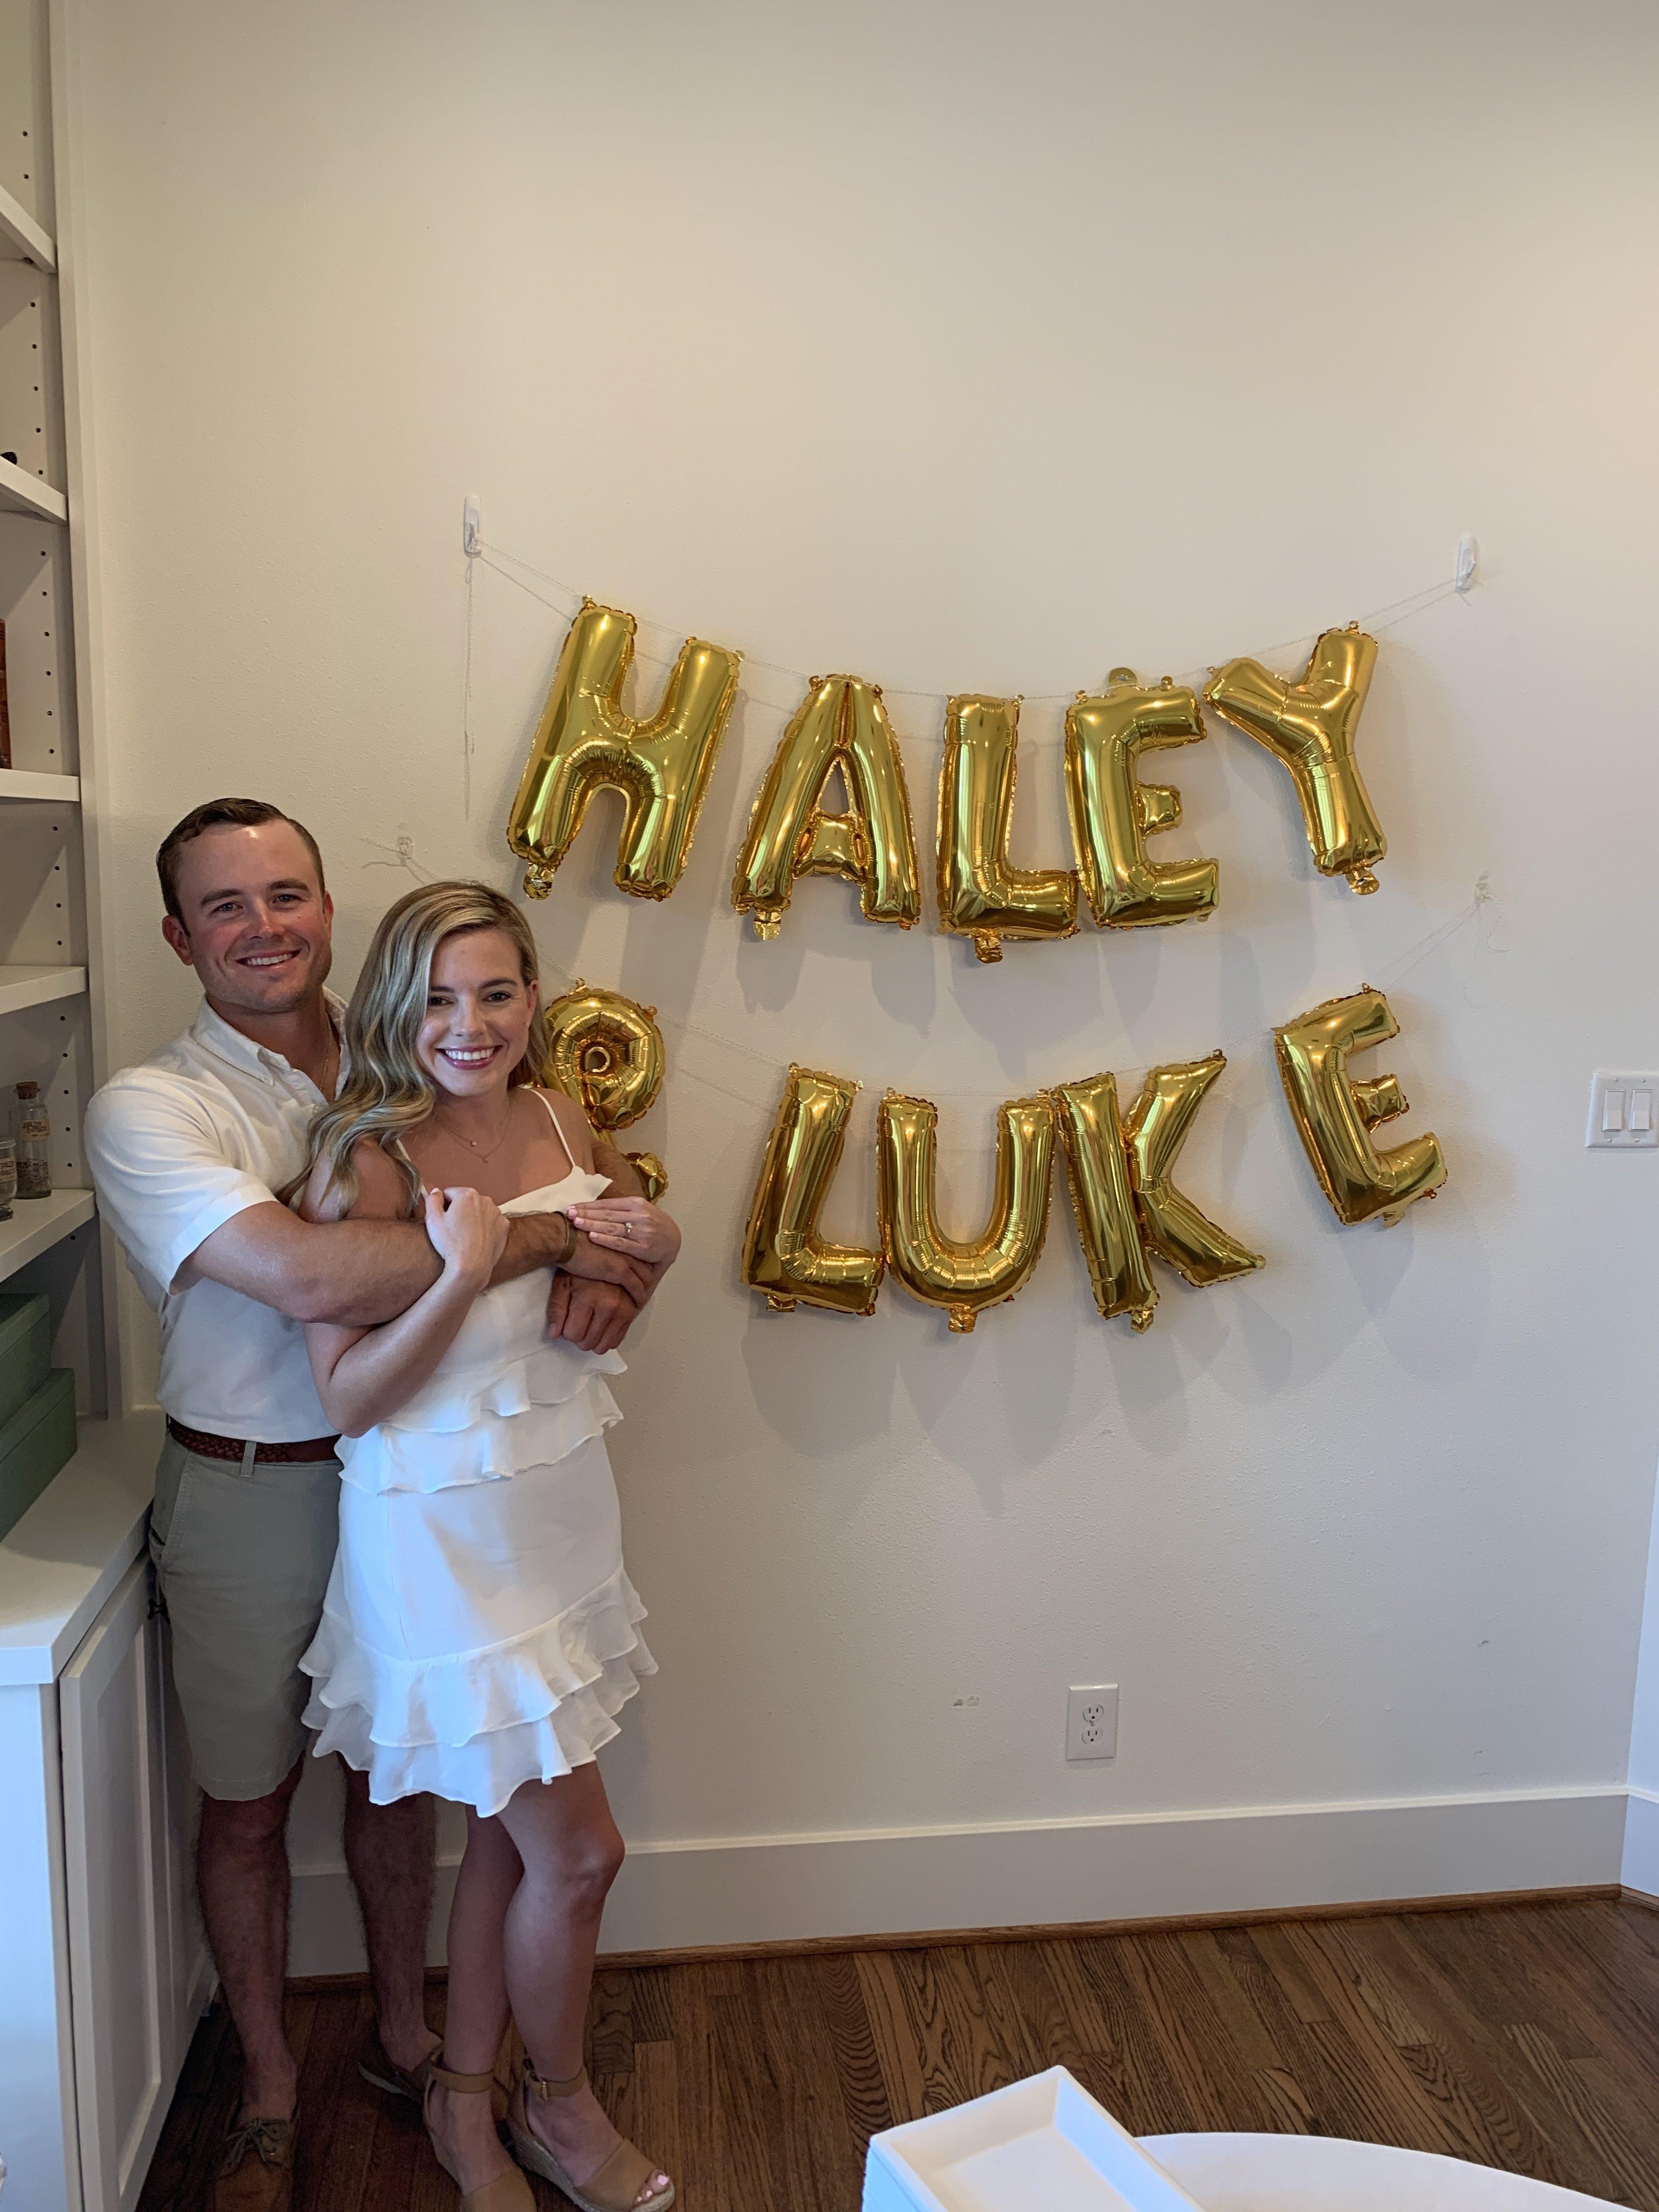 HH Wedding Series- Wedding Showers!